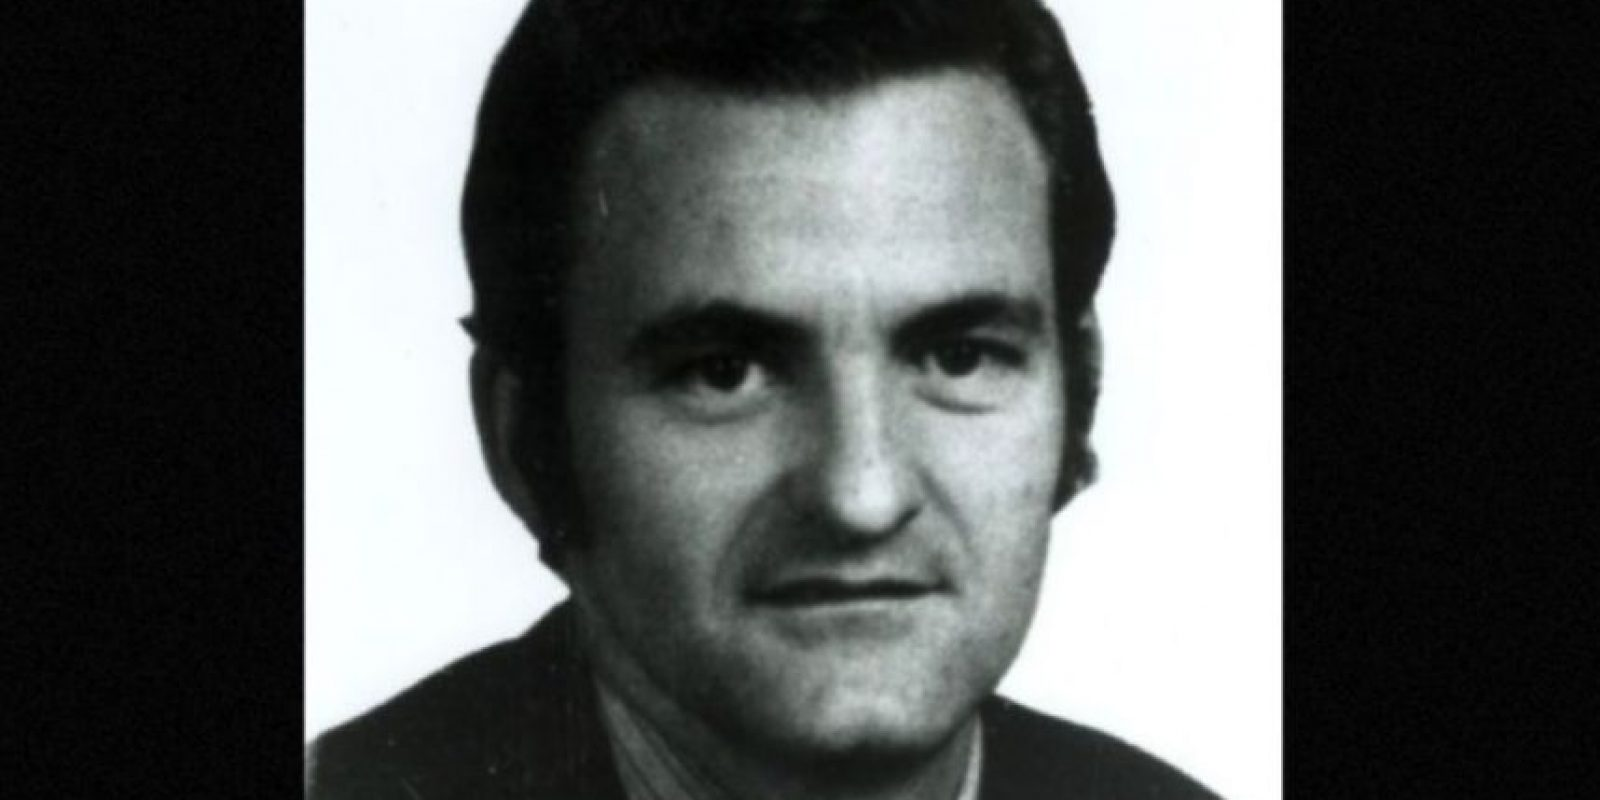 9. William Bradford Bishop, Jr. Foto: fbi.gov/wanted/topten